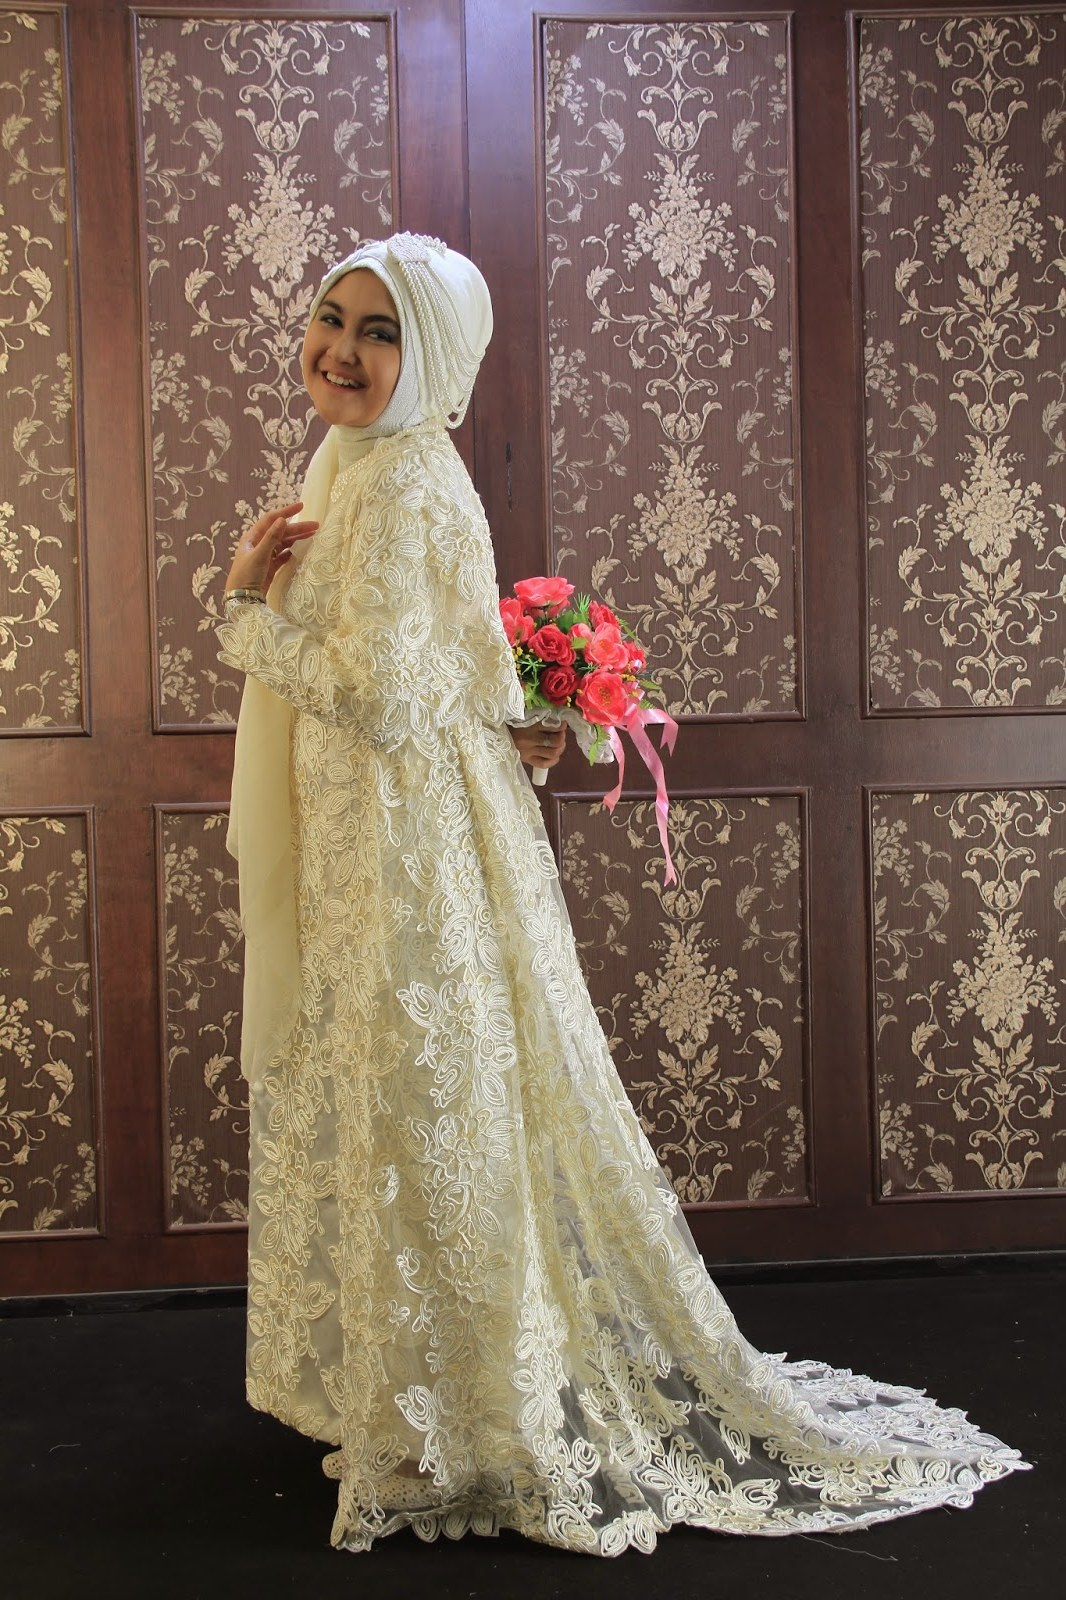 Design Baju Gaun Pengantin Muslim Wddj Padme Wedding Dress Replica – Fashion Dresses